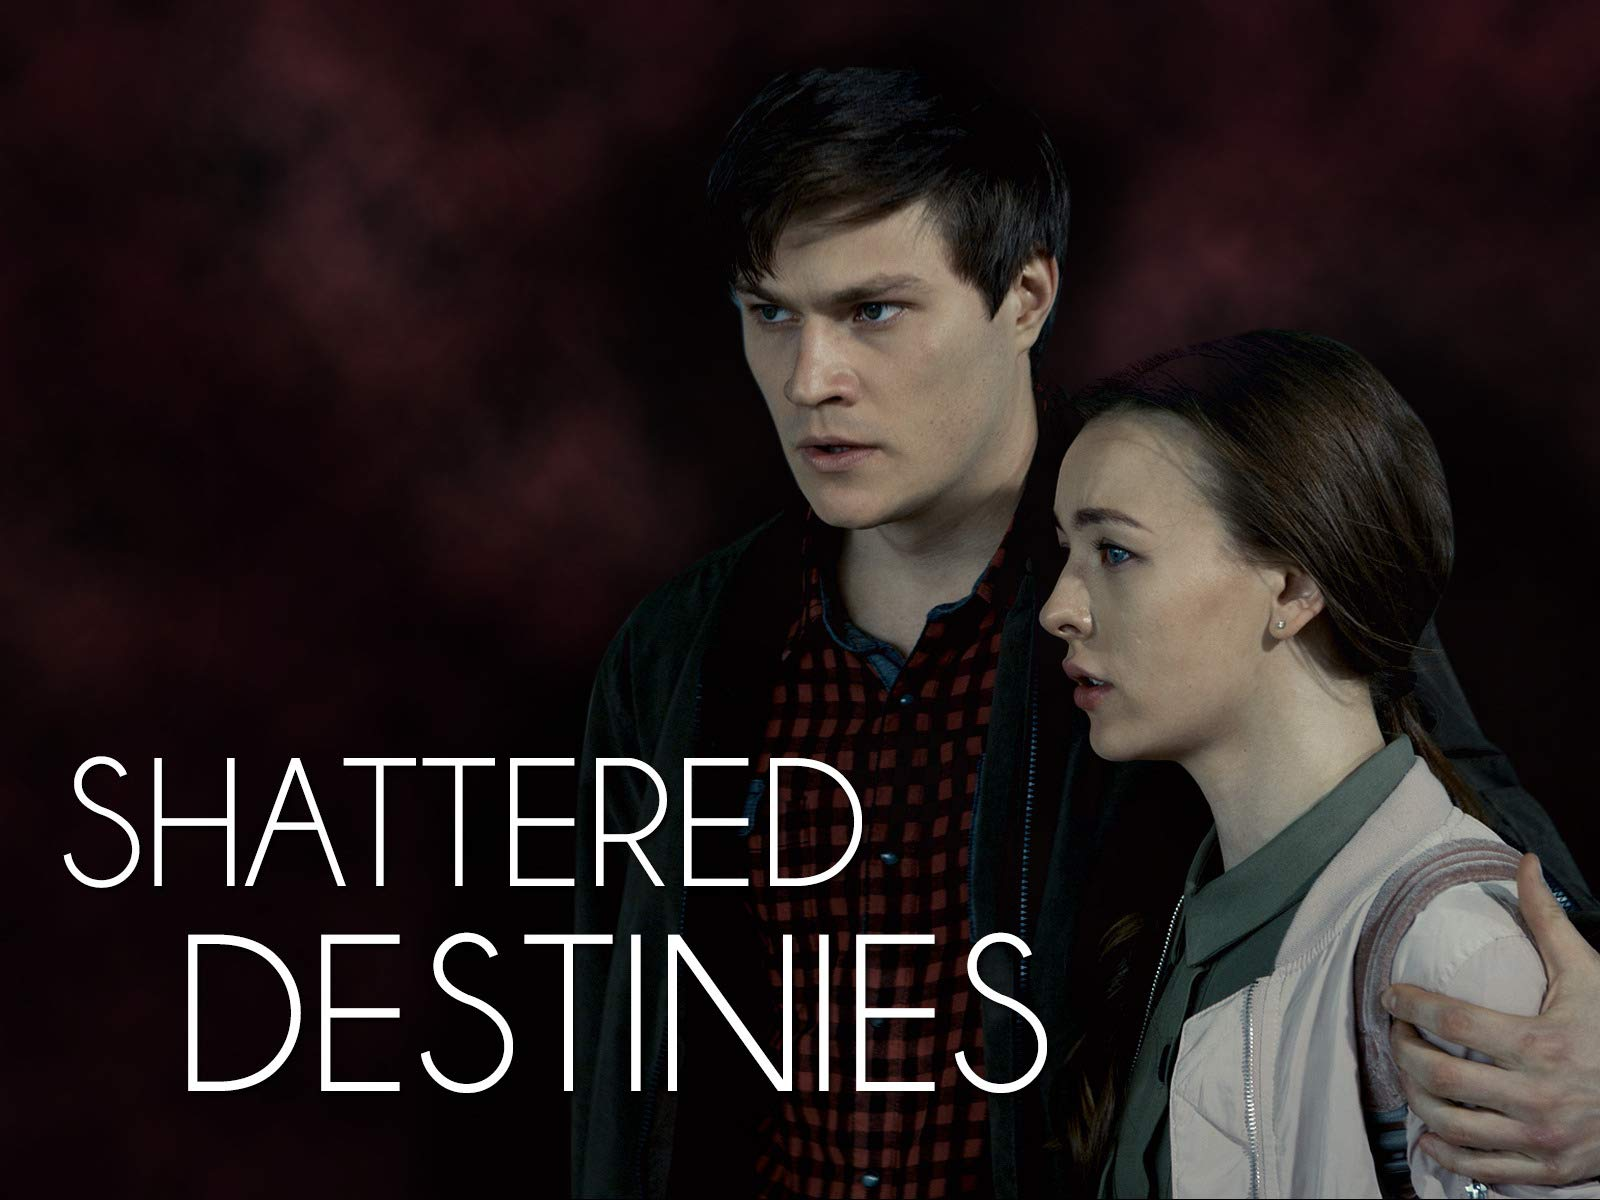 Shattered Destinies